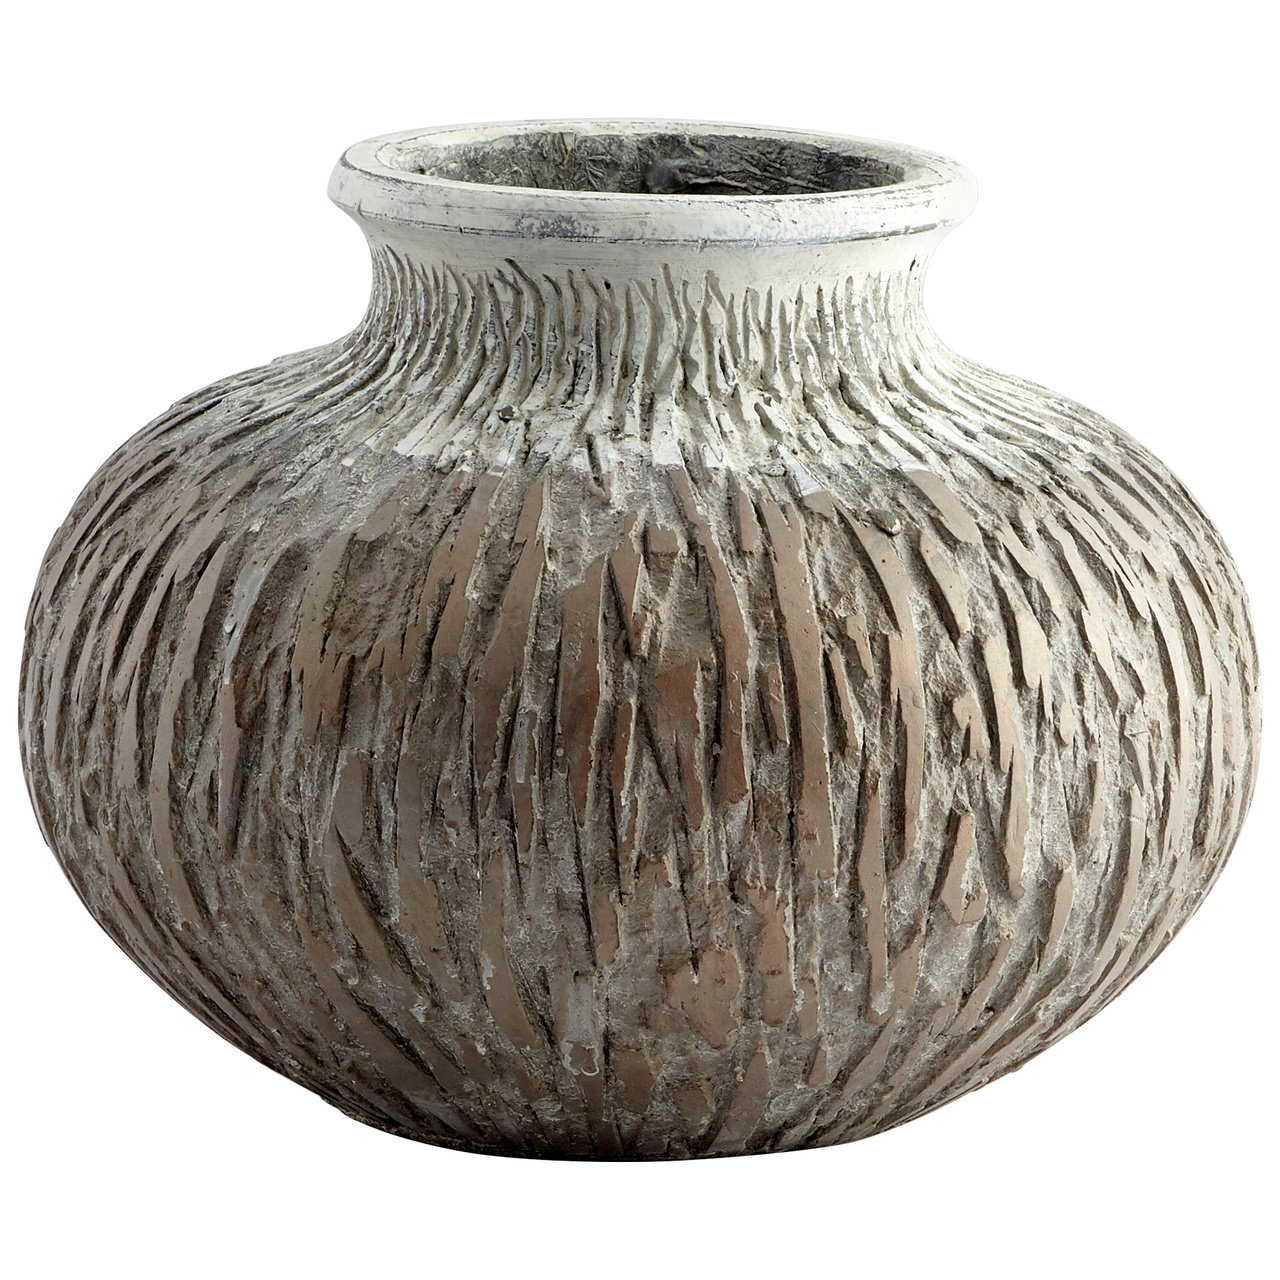 CYAN DESIGN 09615 Medium Acorn Planter, Golden Antique